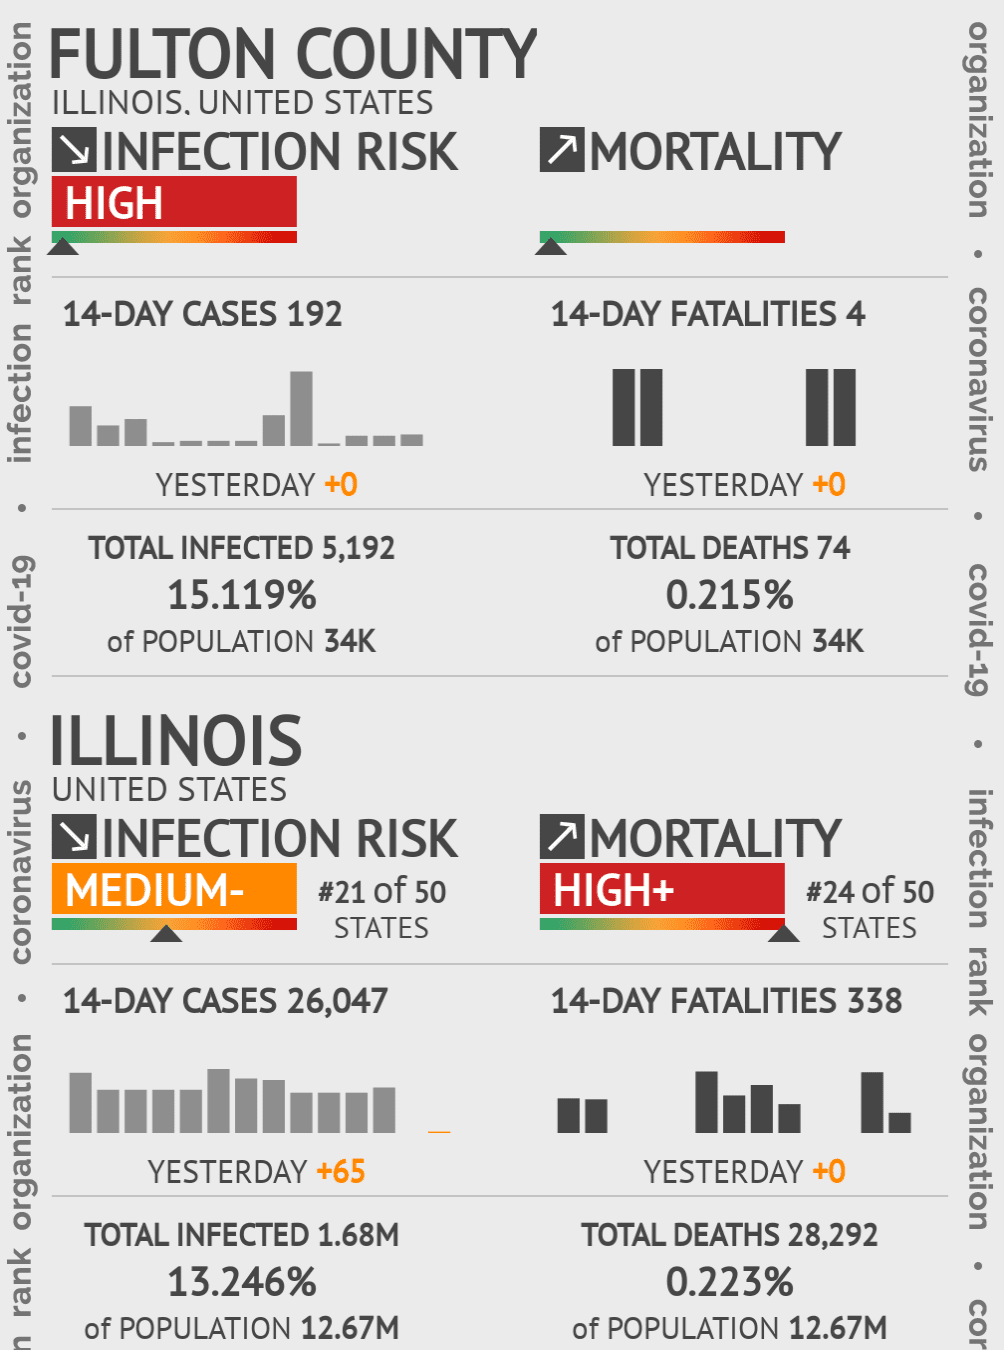 Fulton County Coronavirus Covid-19 Risk of Infection on November 29, 2020